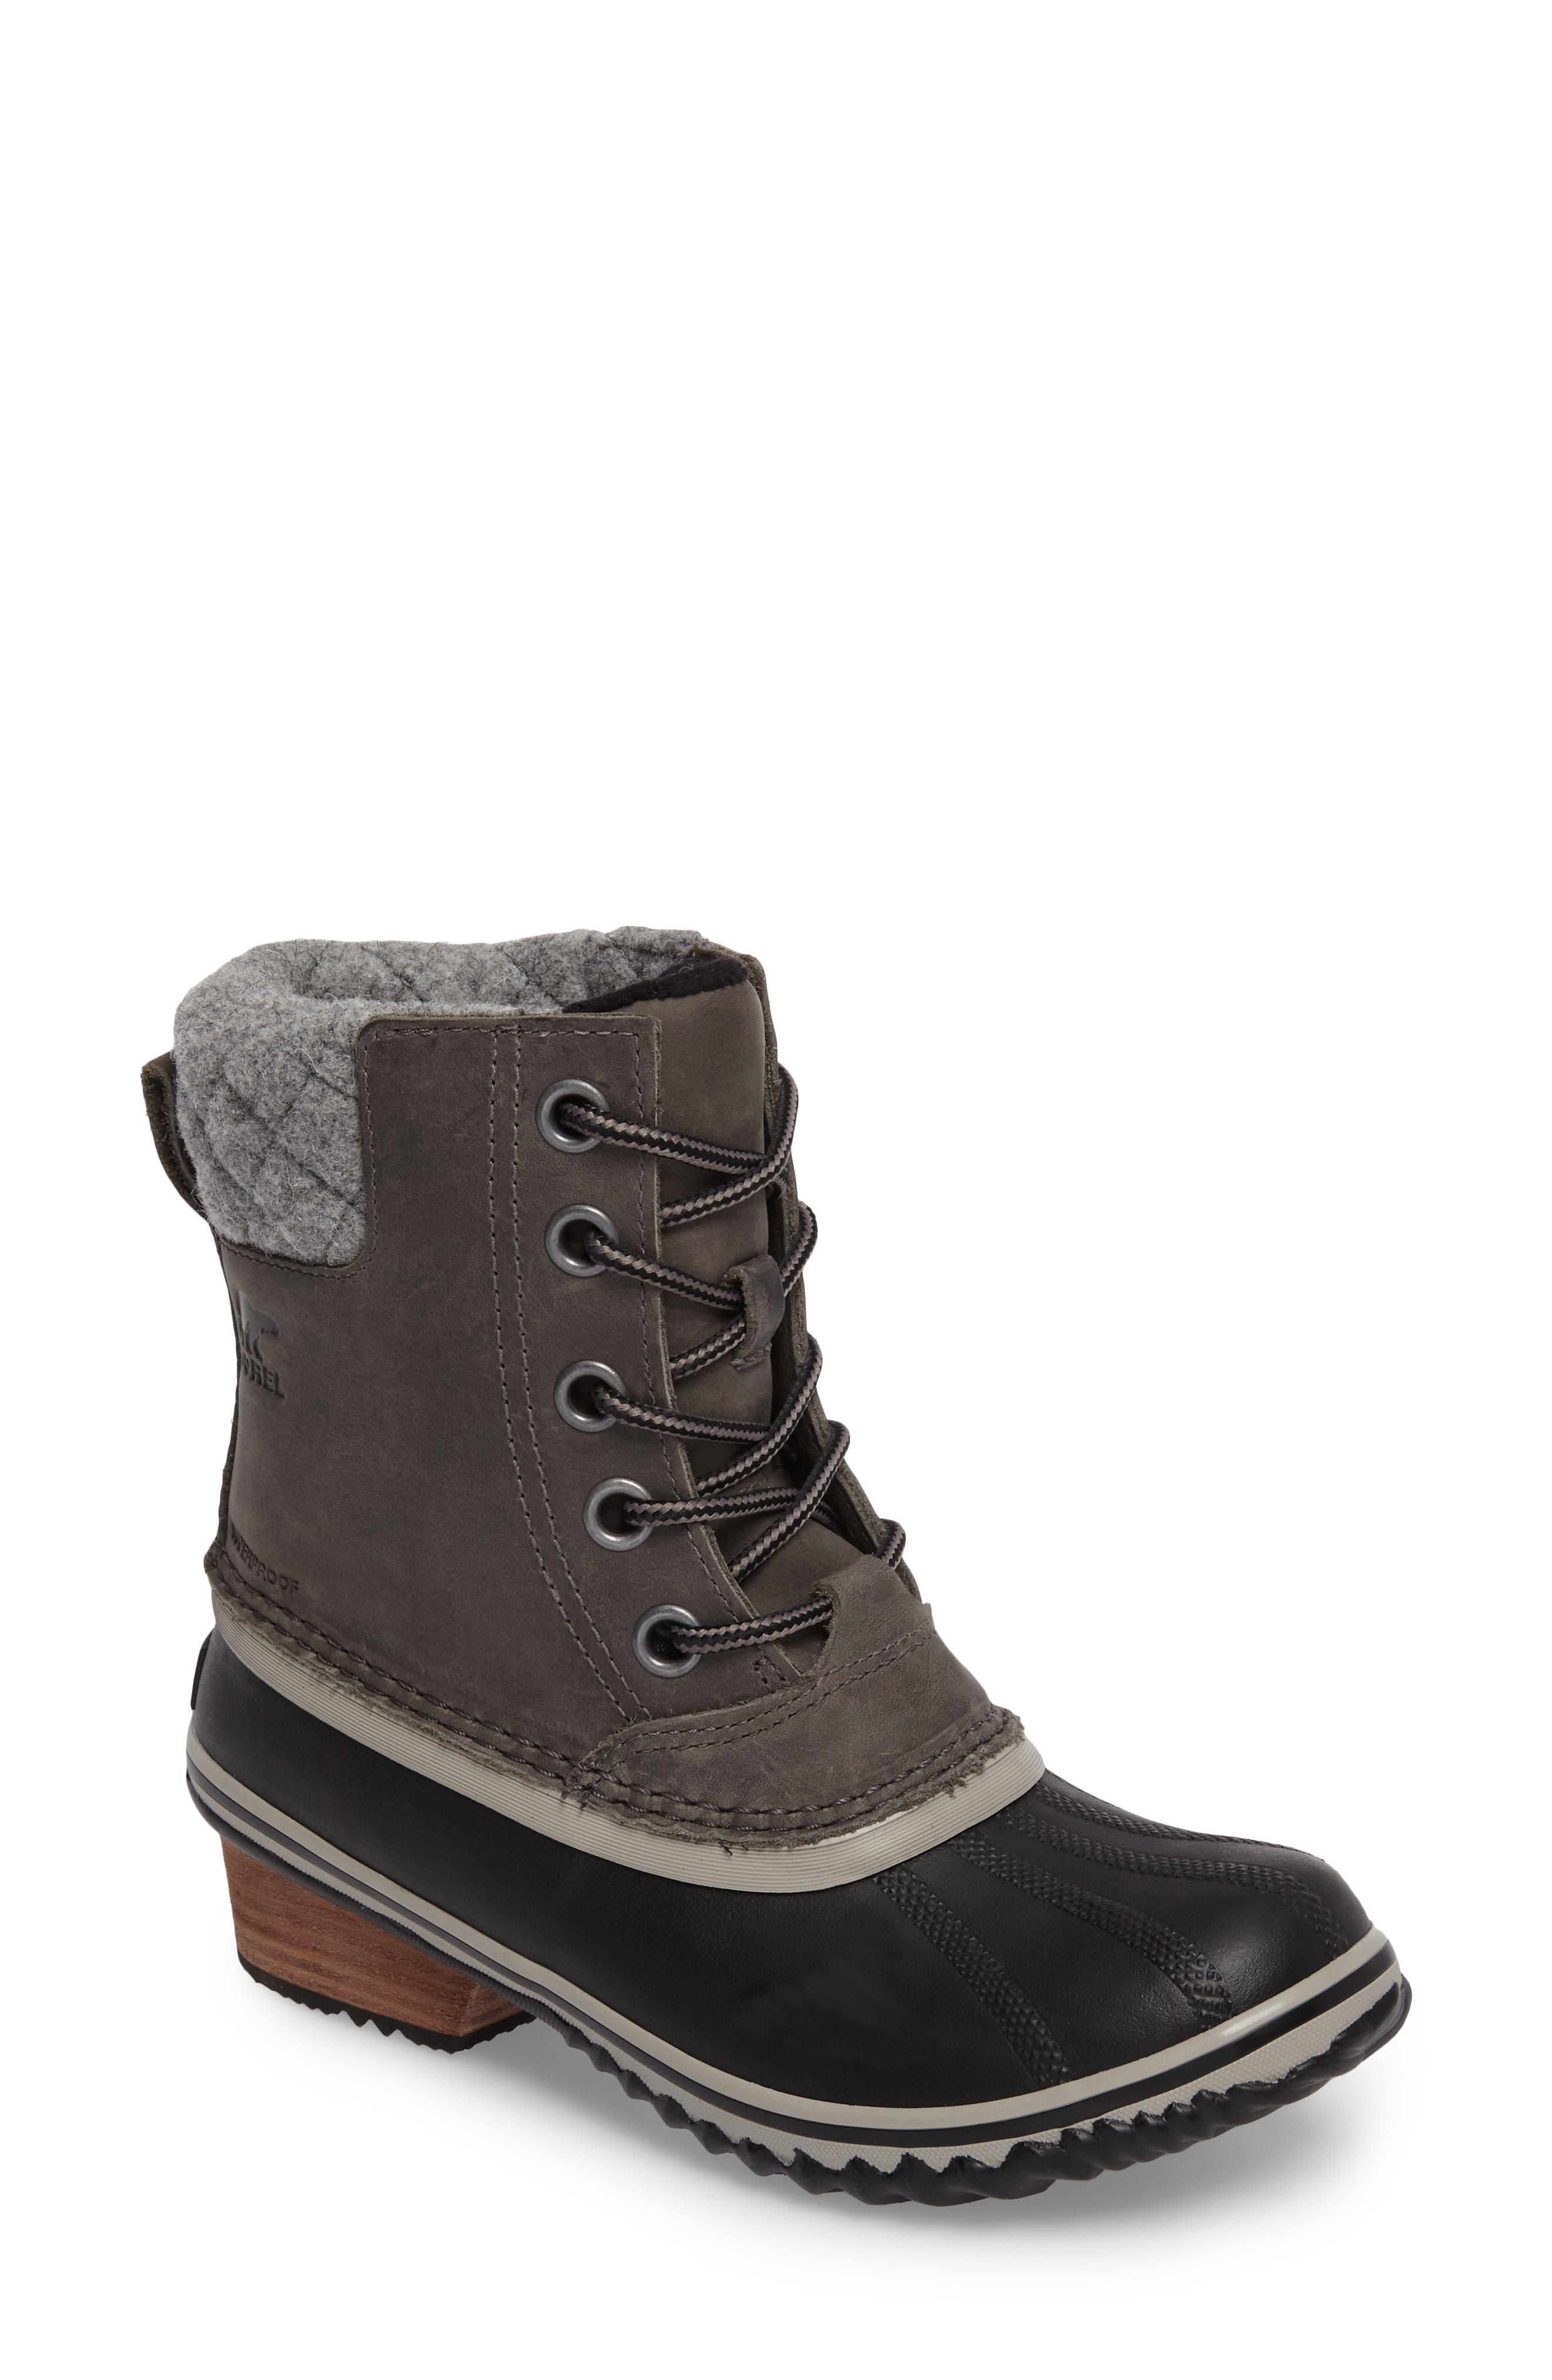 4095a0538dc Sale  Women s SOREL Boots   Booties